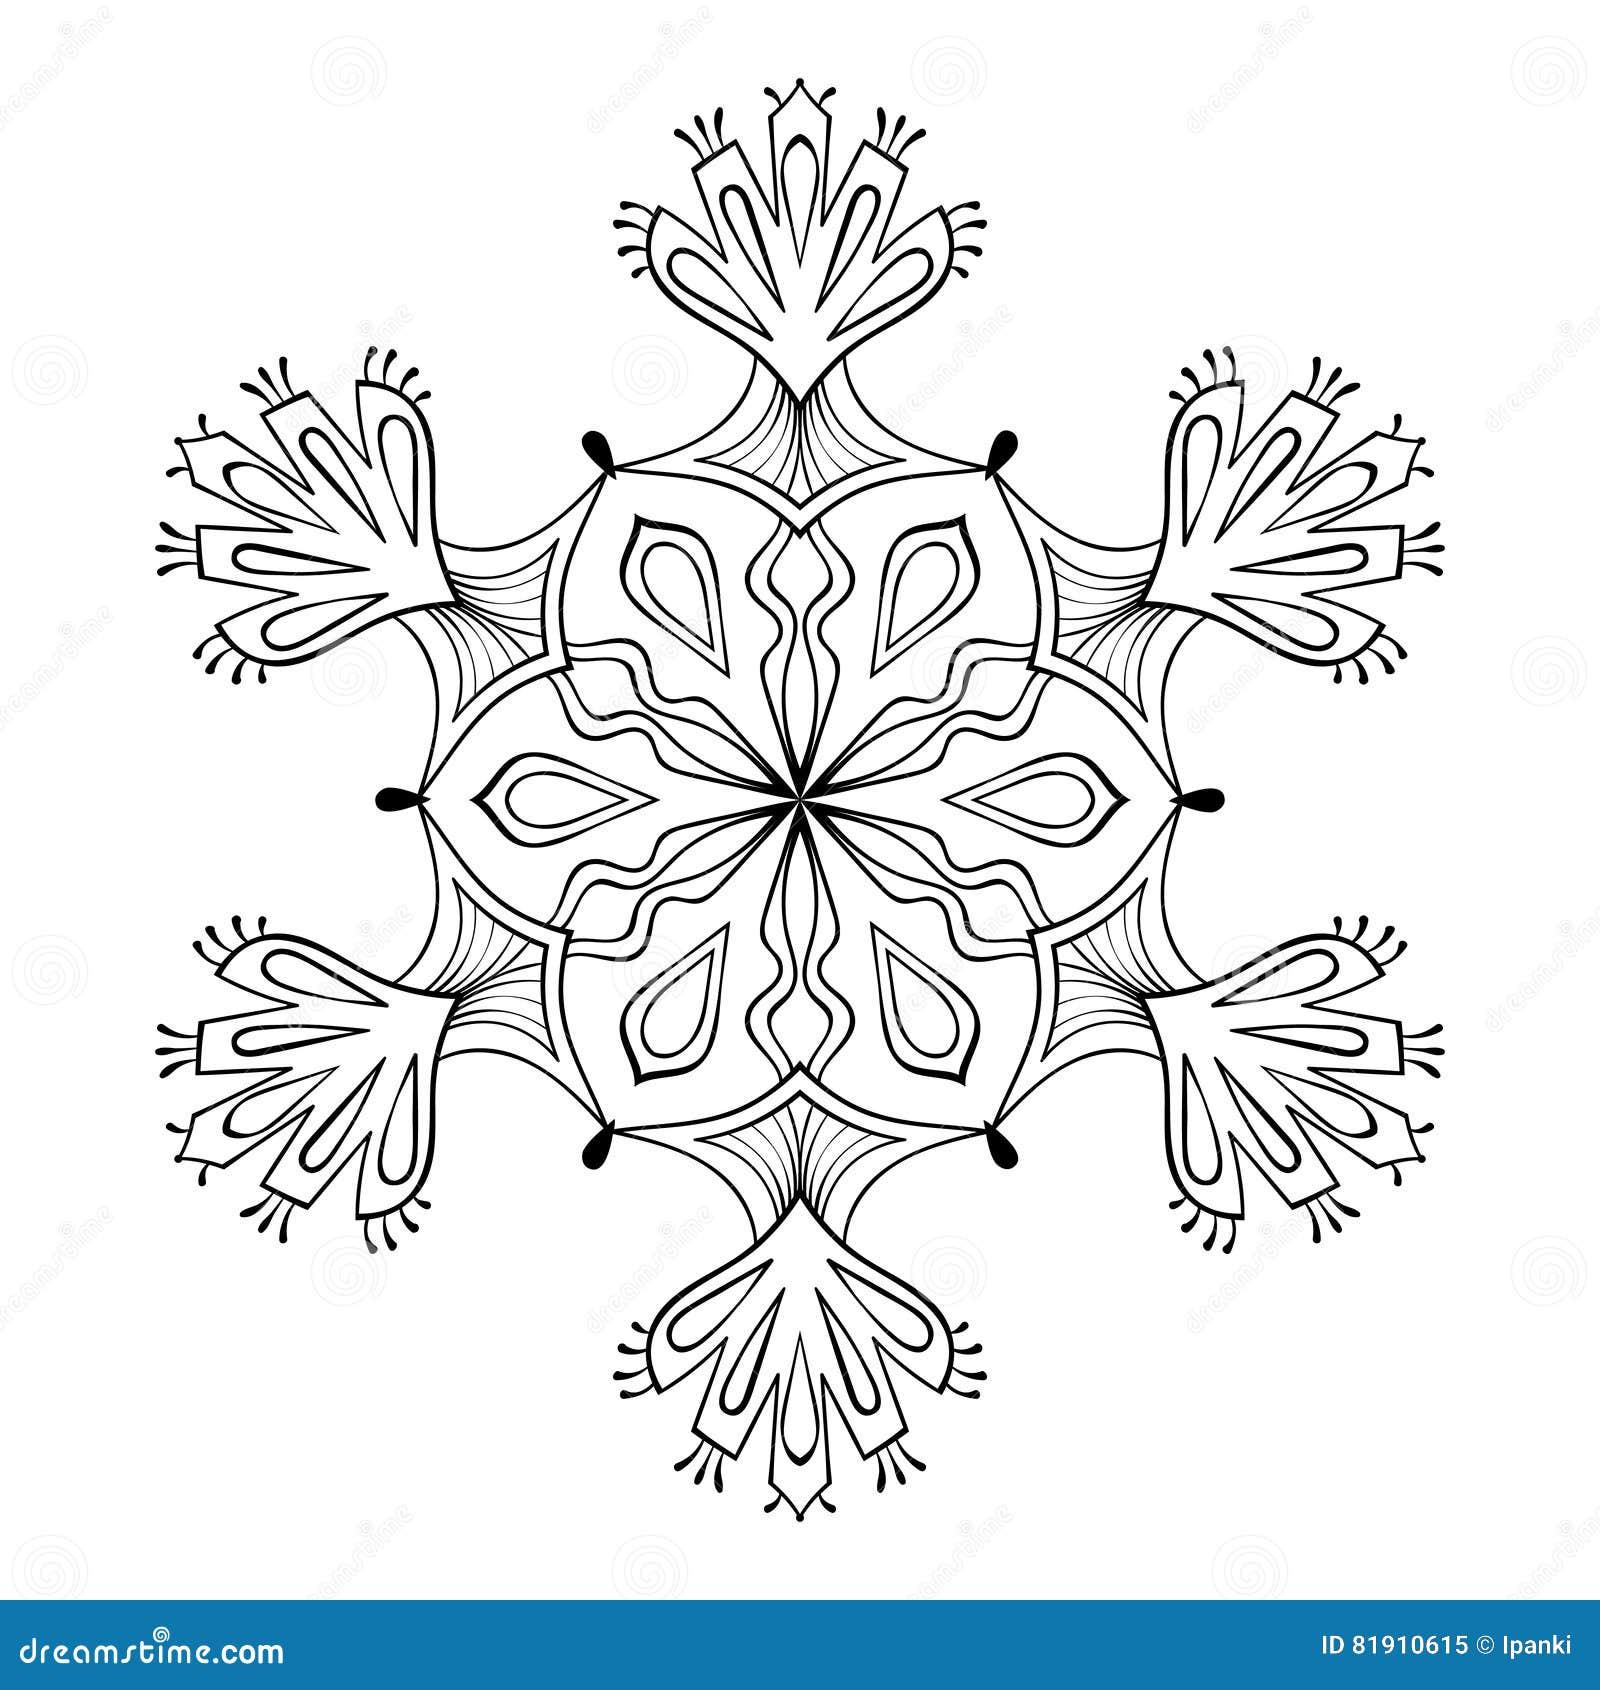 vector snow flake in zentangle doodle style mandala for adult c stock vector illustration of. Black Bedroom Furniture Sets. Home Design Ideas